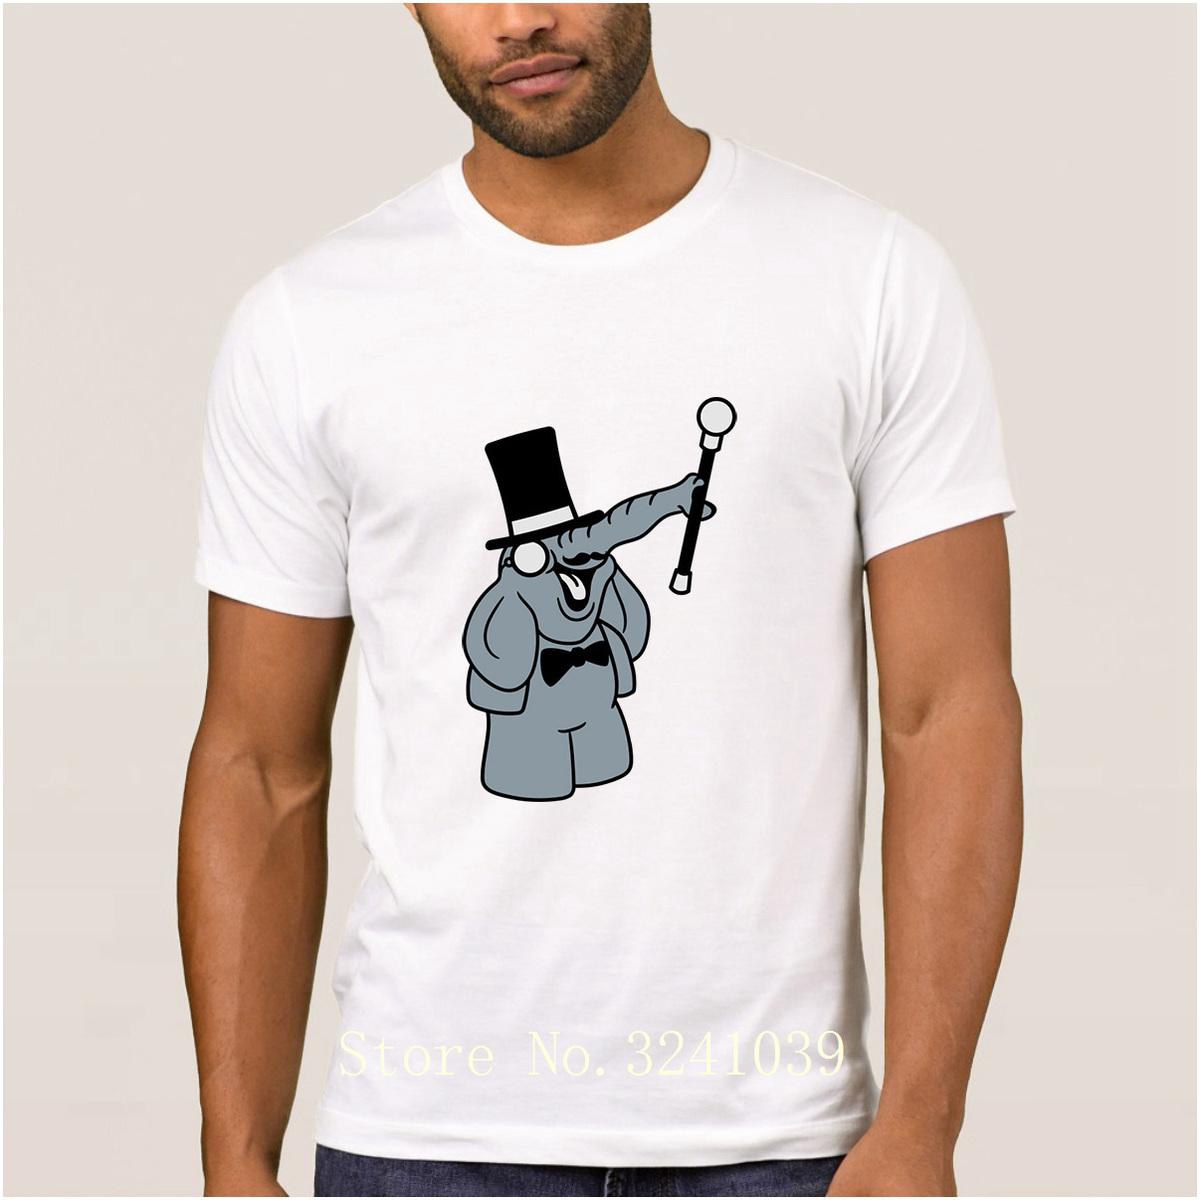 La Maxpa Casual hat monocle suit sir gentlemen stock trunk t shirt Spring t-shirt for men Short Sleeve regular tshirt for men